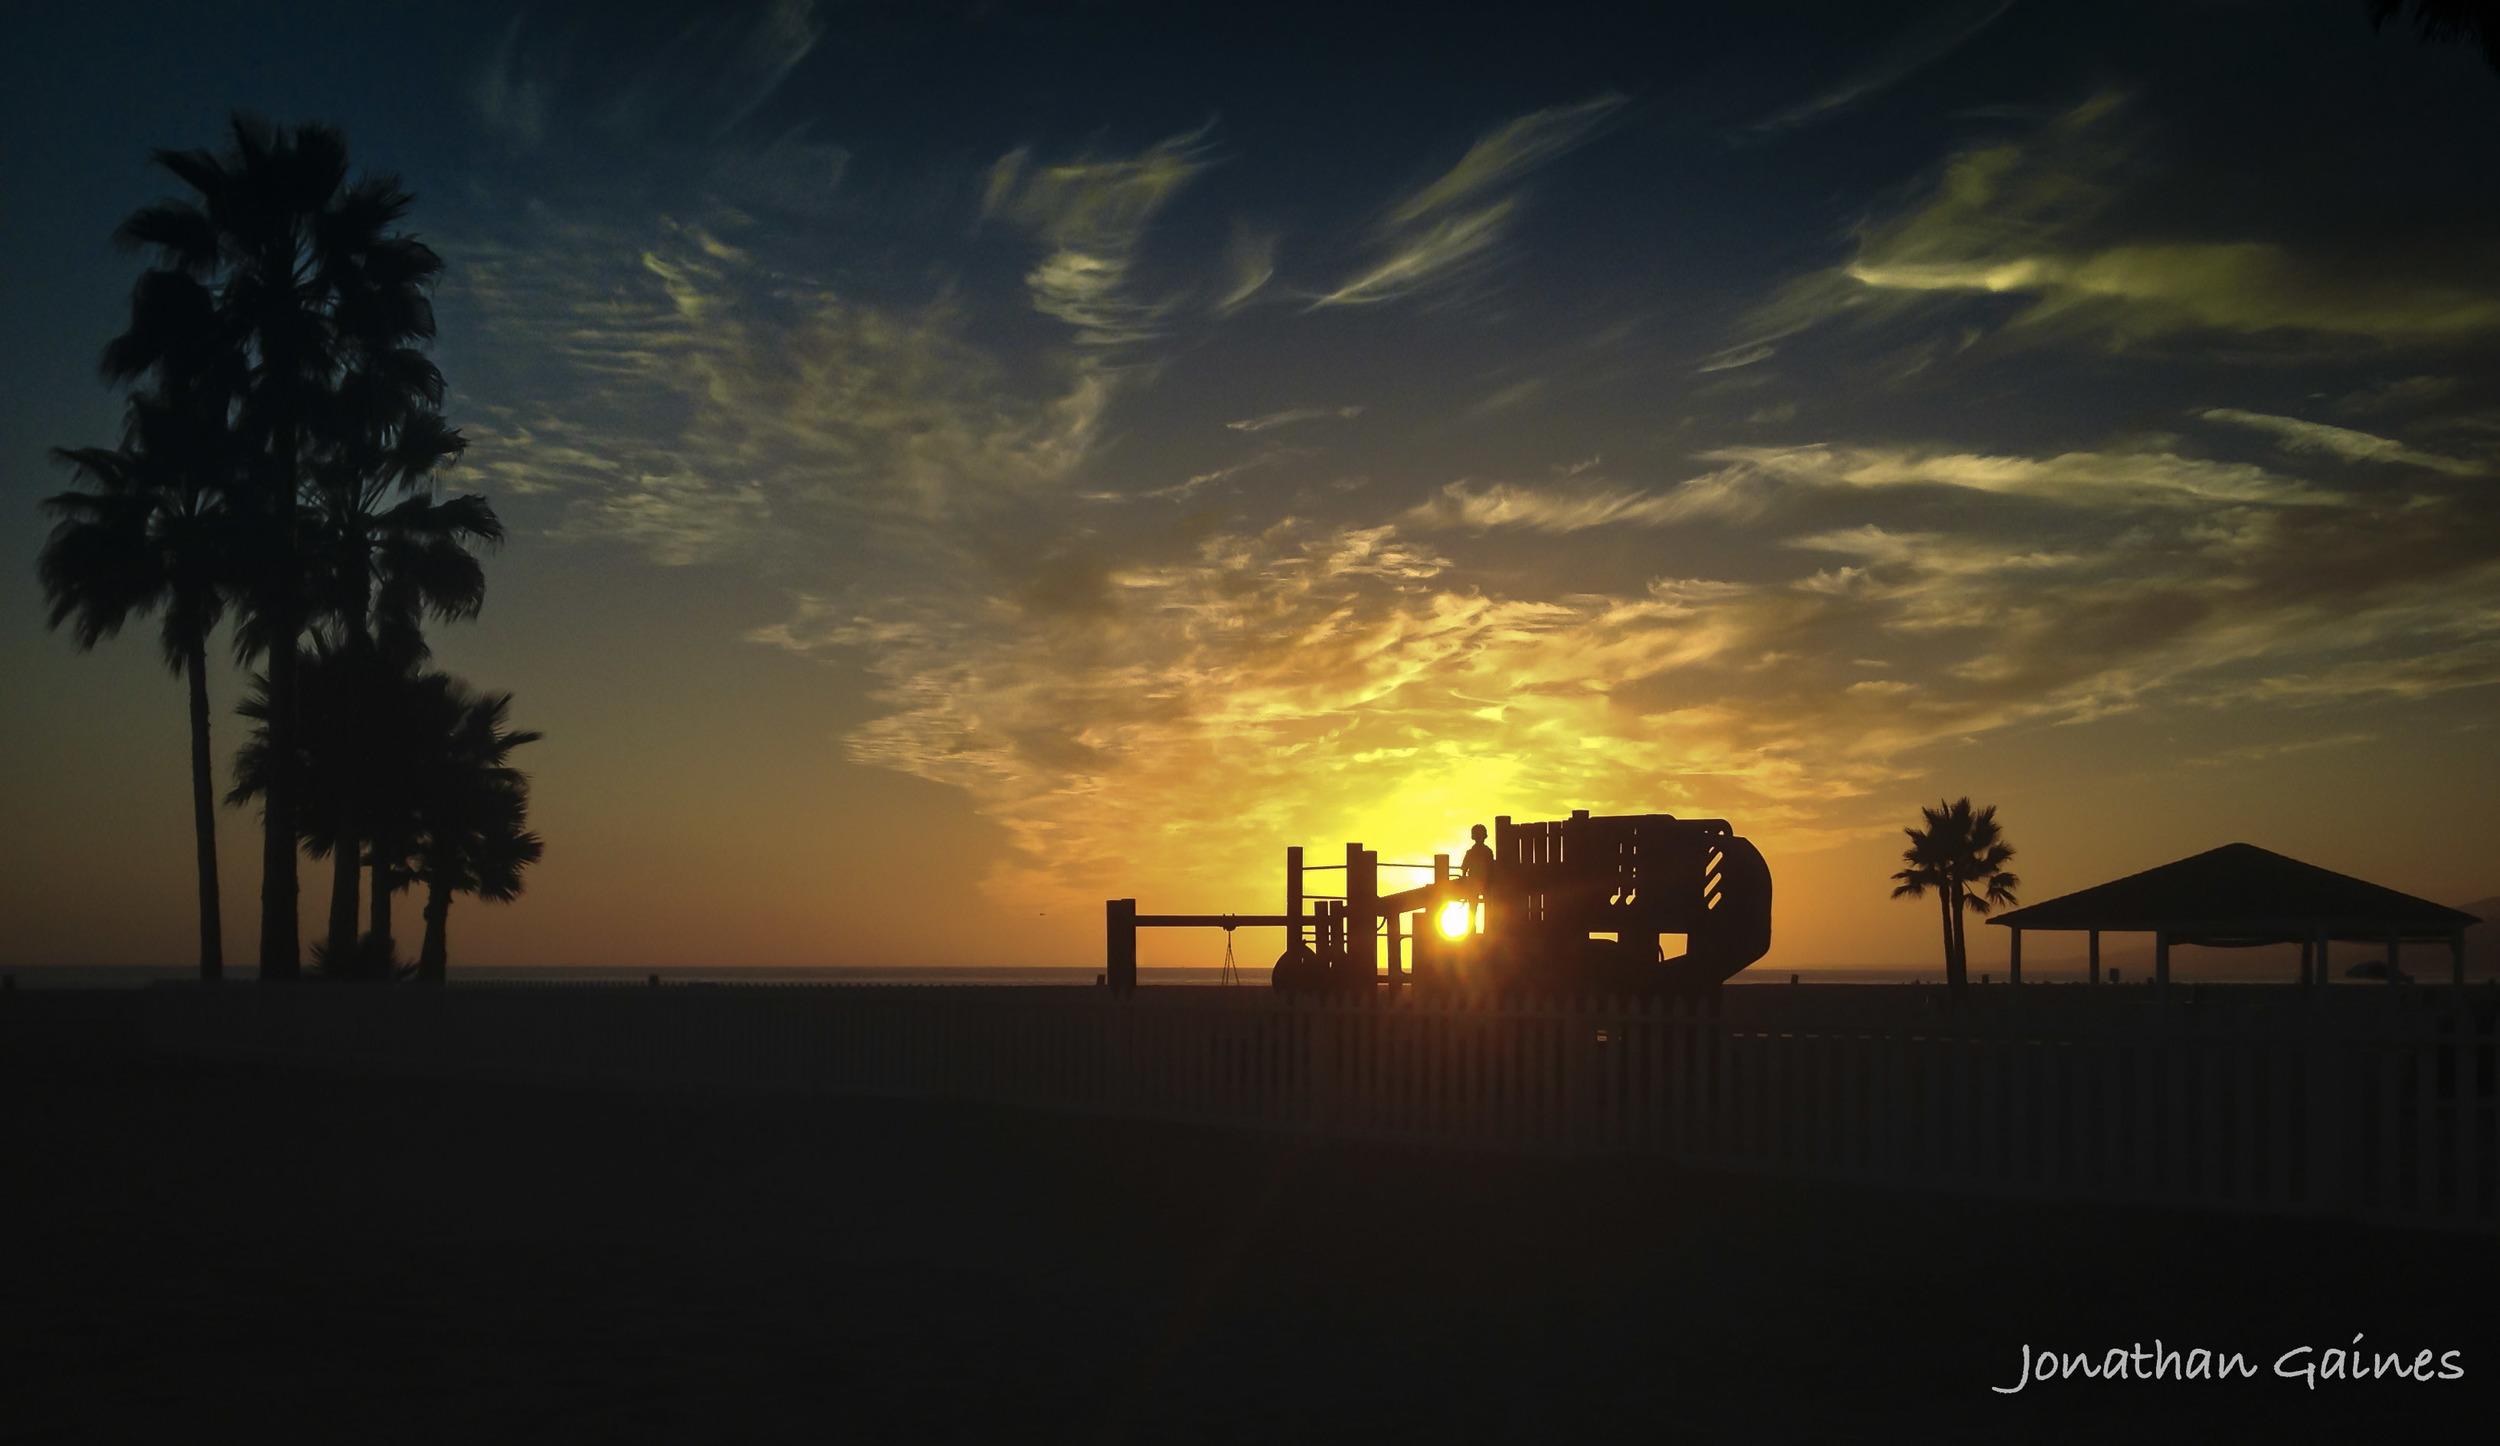 BeachParkSunset-1.jpg